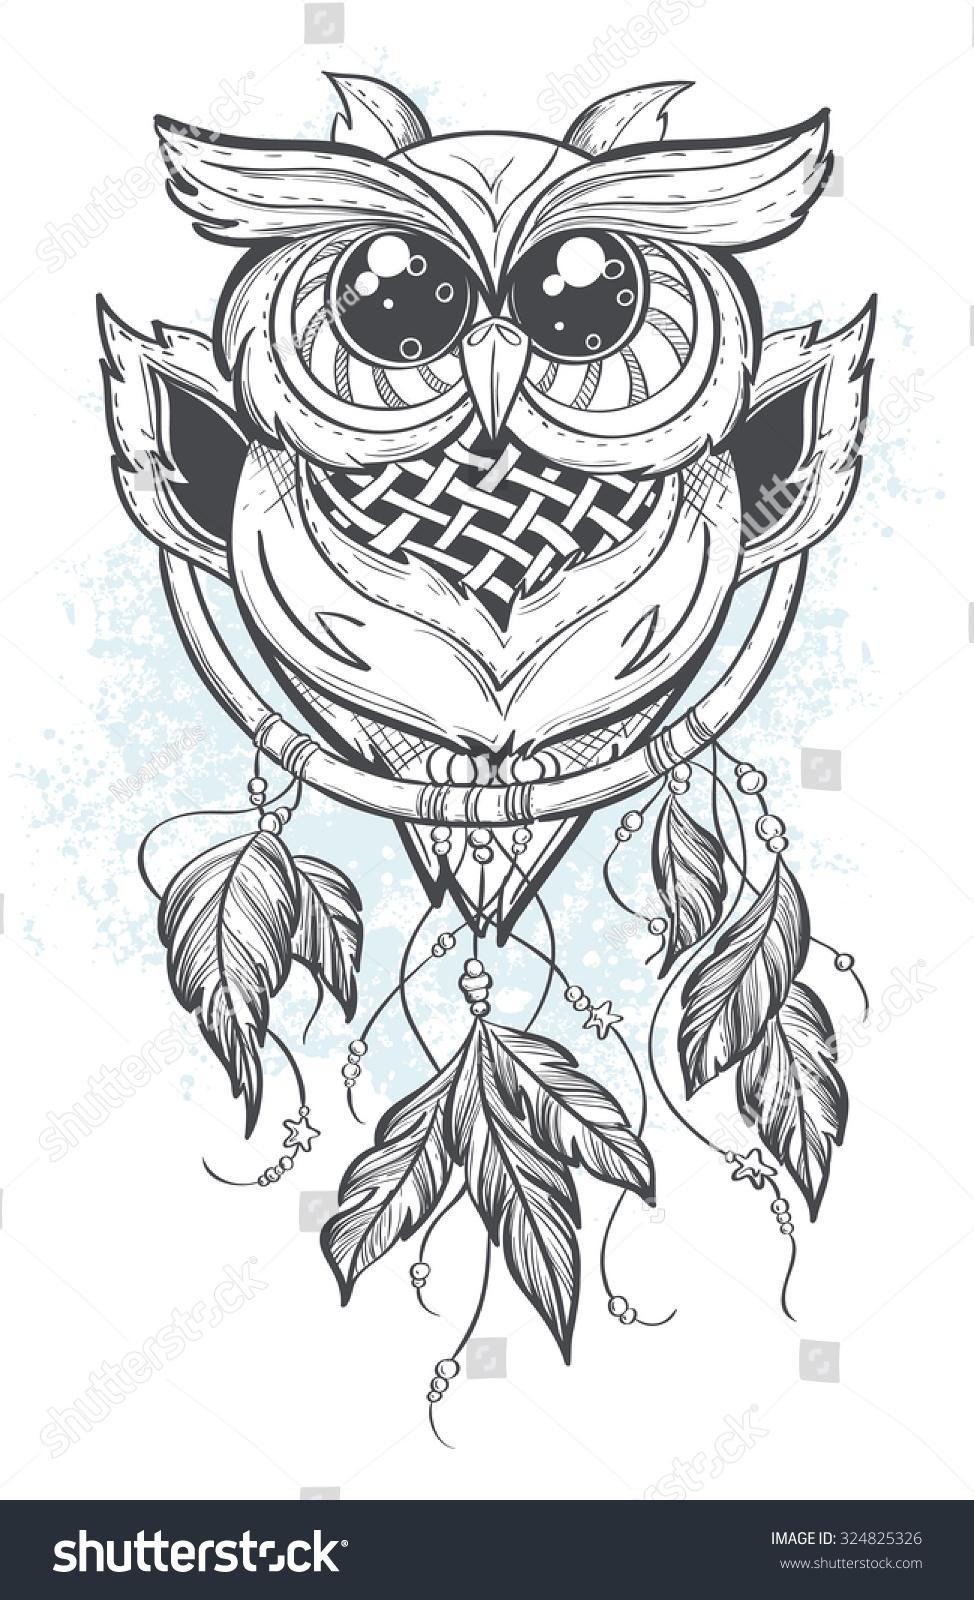 Owl dreamcatcher drawing - photo#34